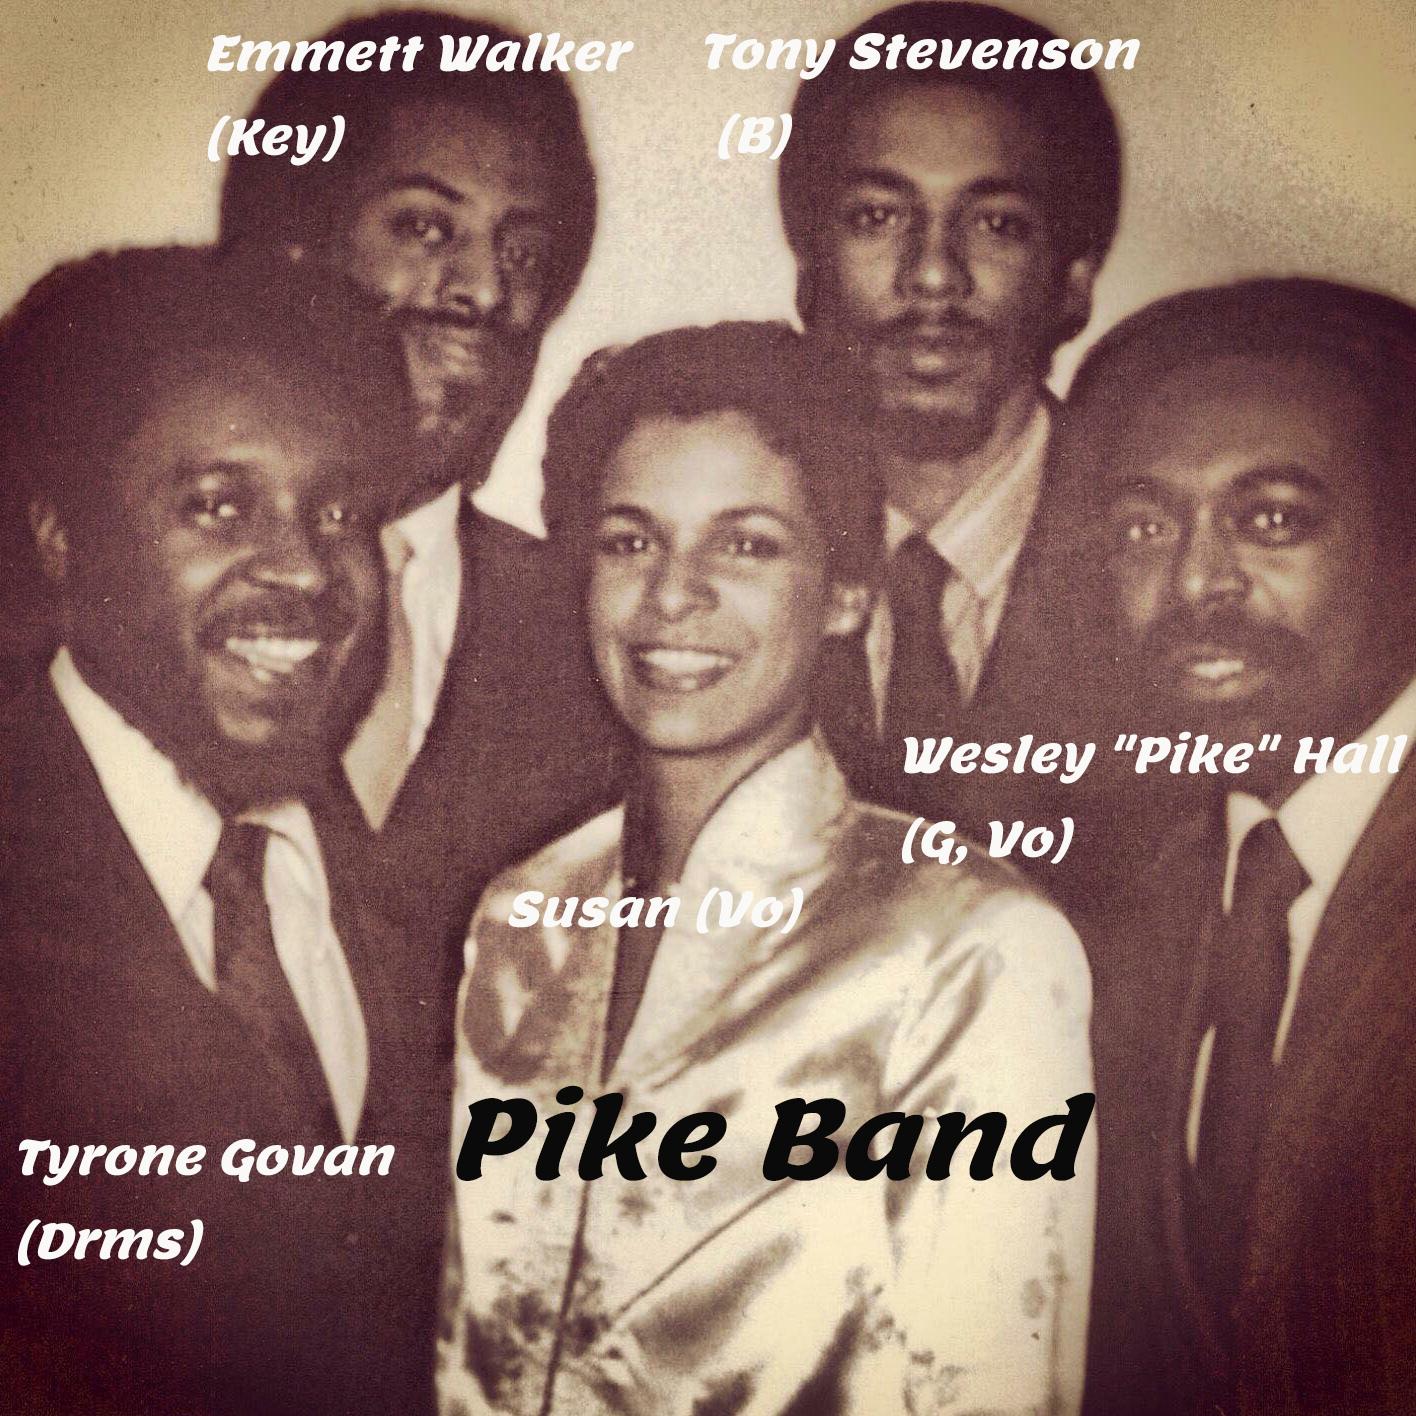 PIKE Band メンバ-